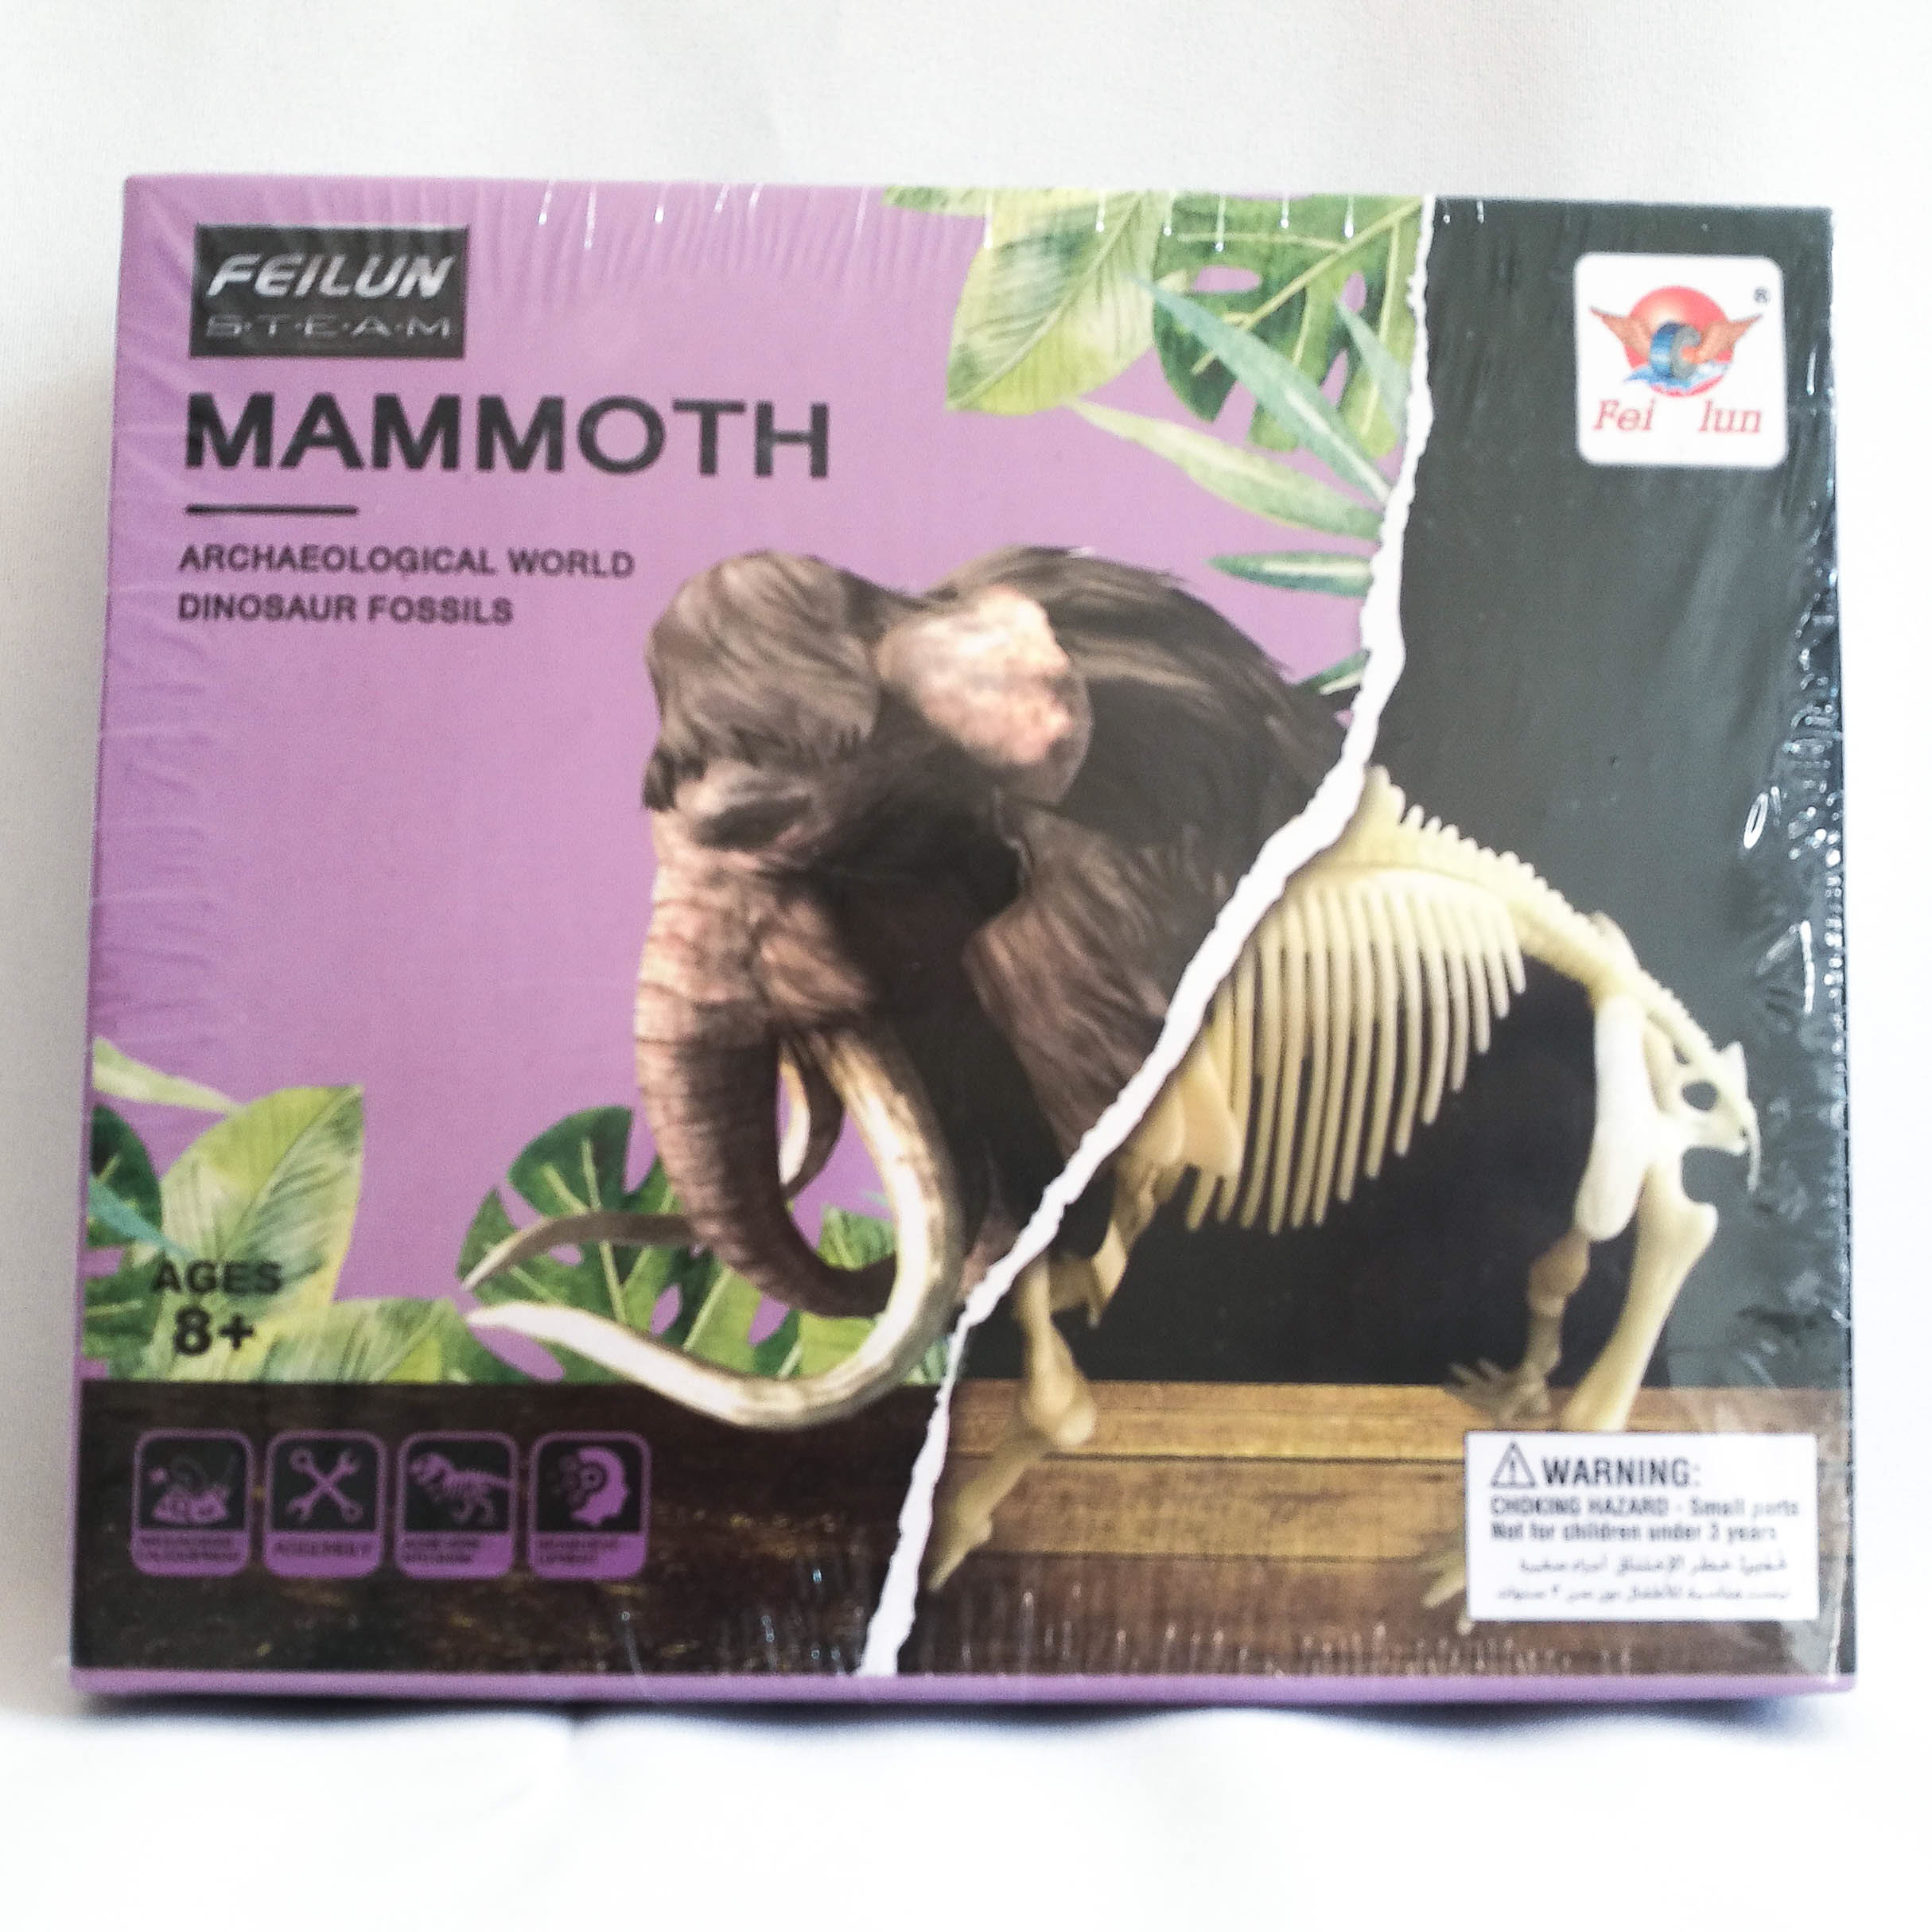 Mammoth - Archaelogical World Dinosaur Fossil